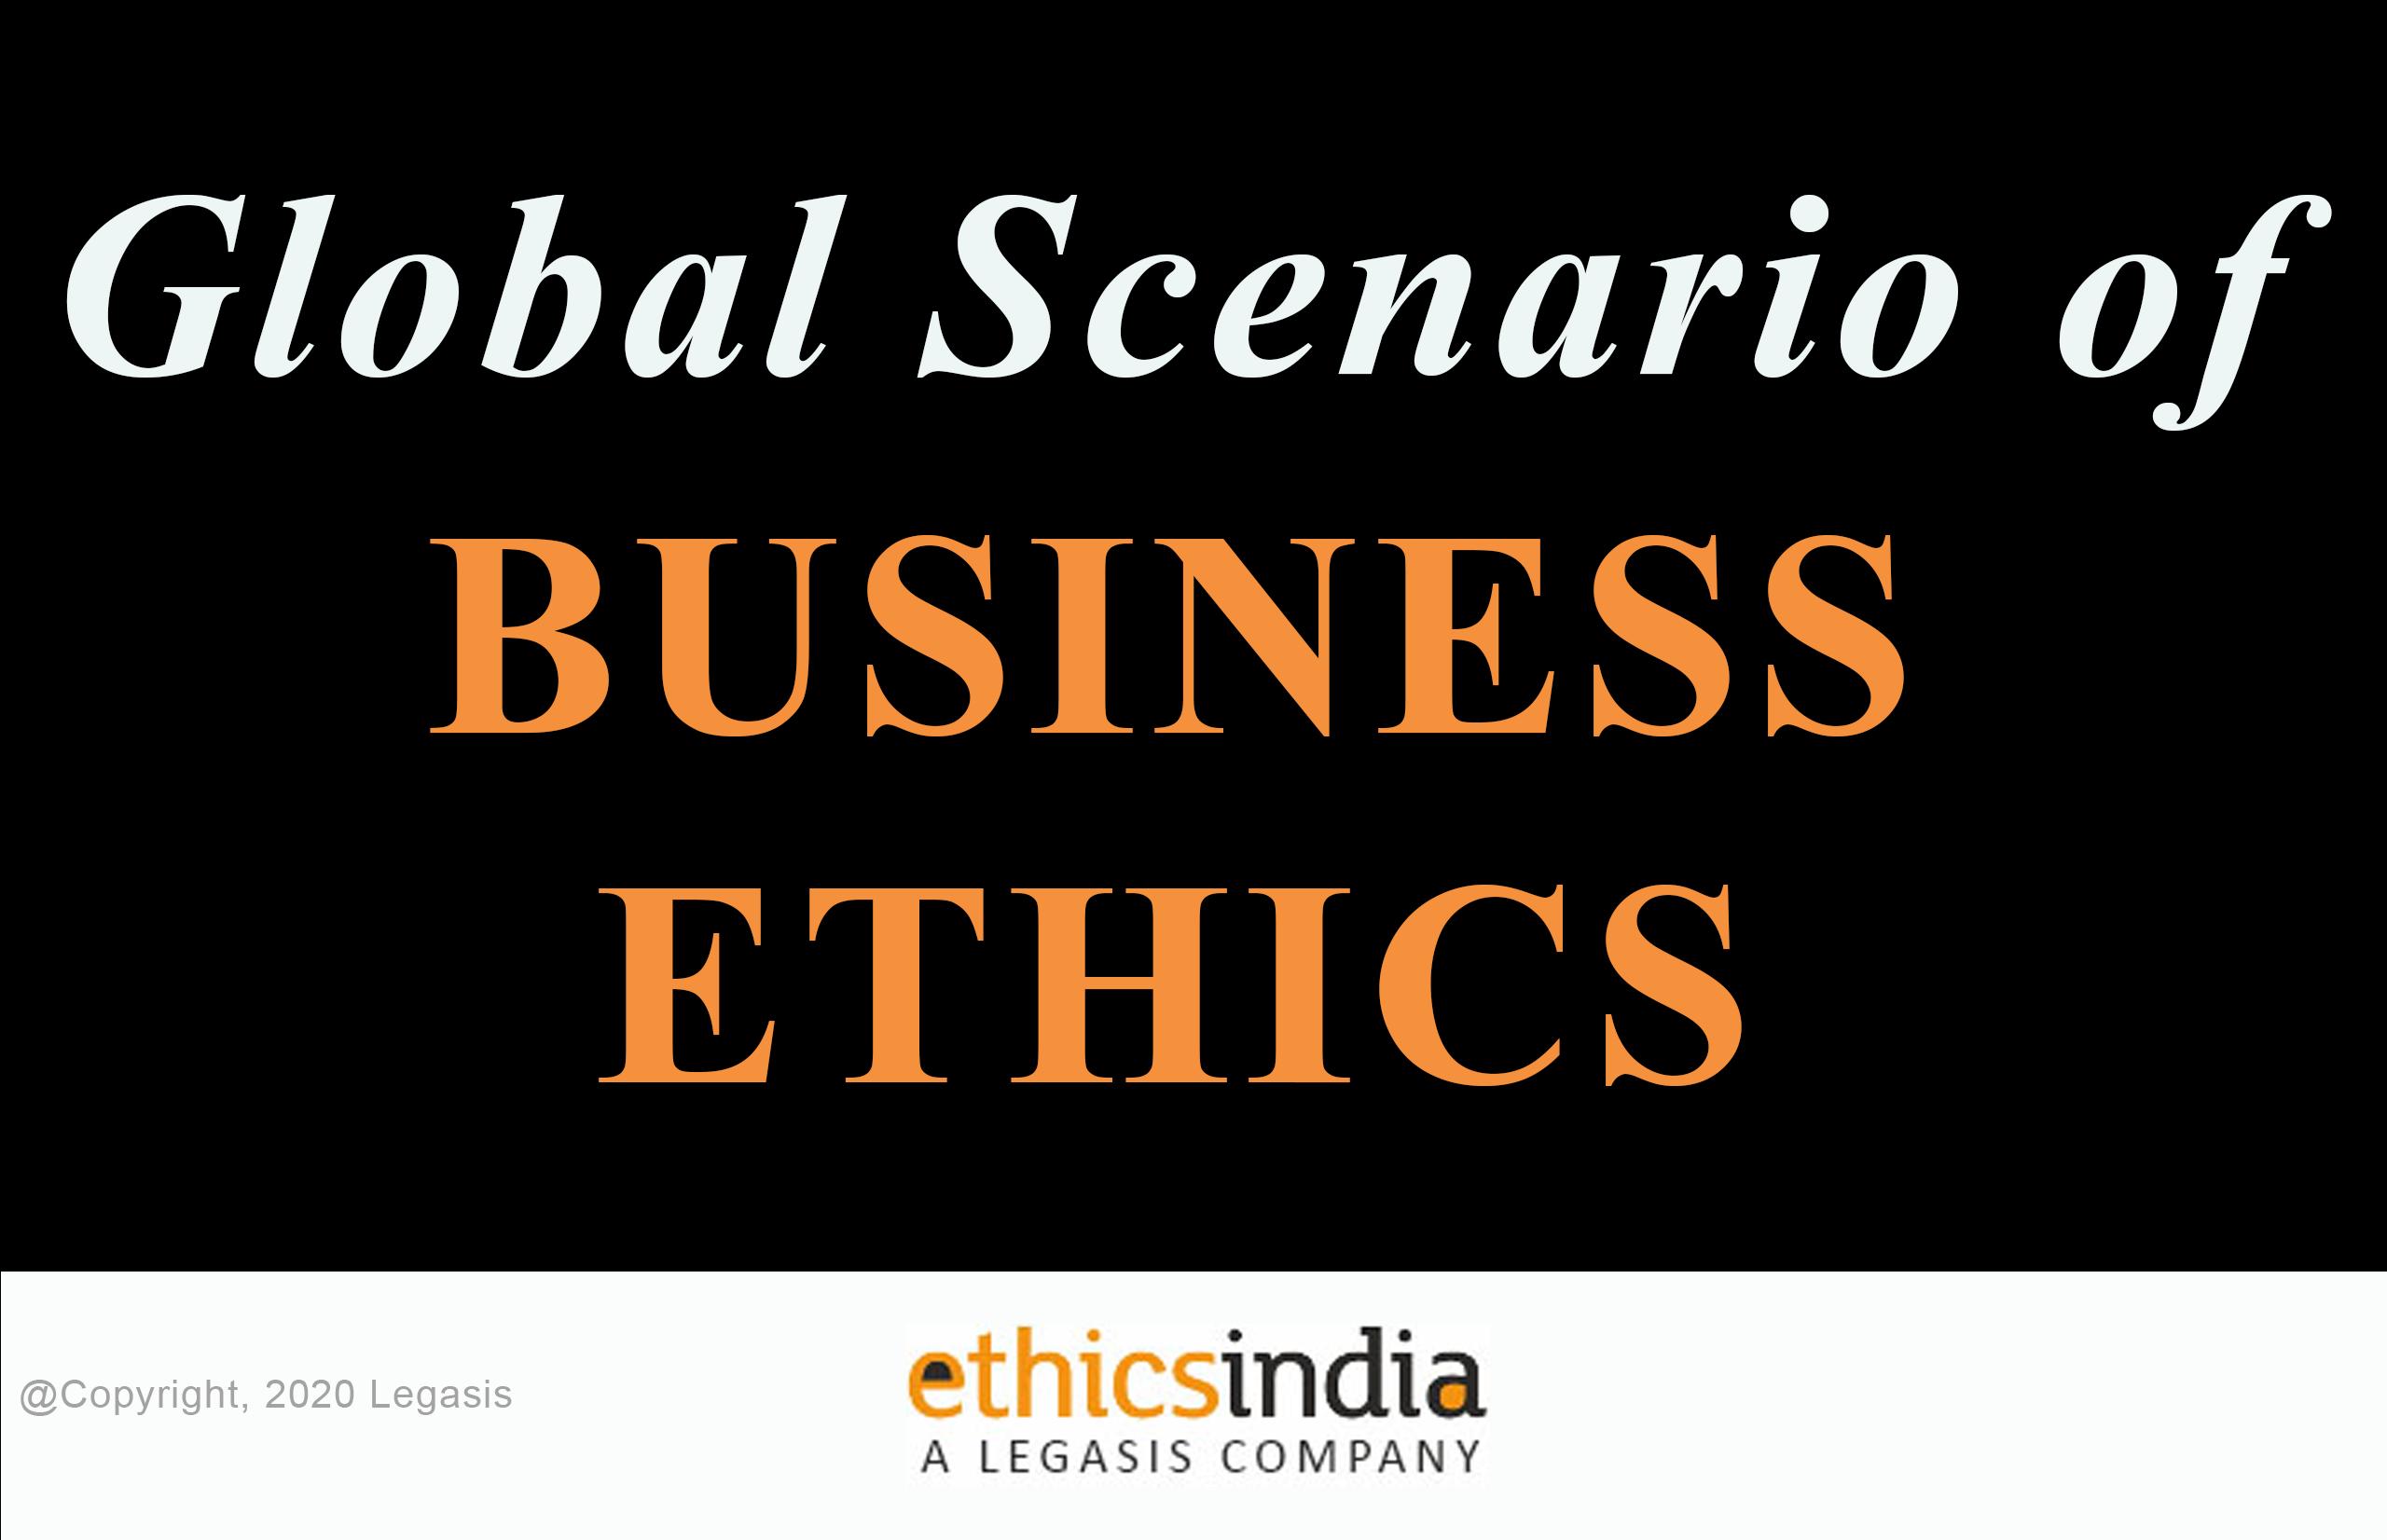 Global Scenario of Business Ethics